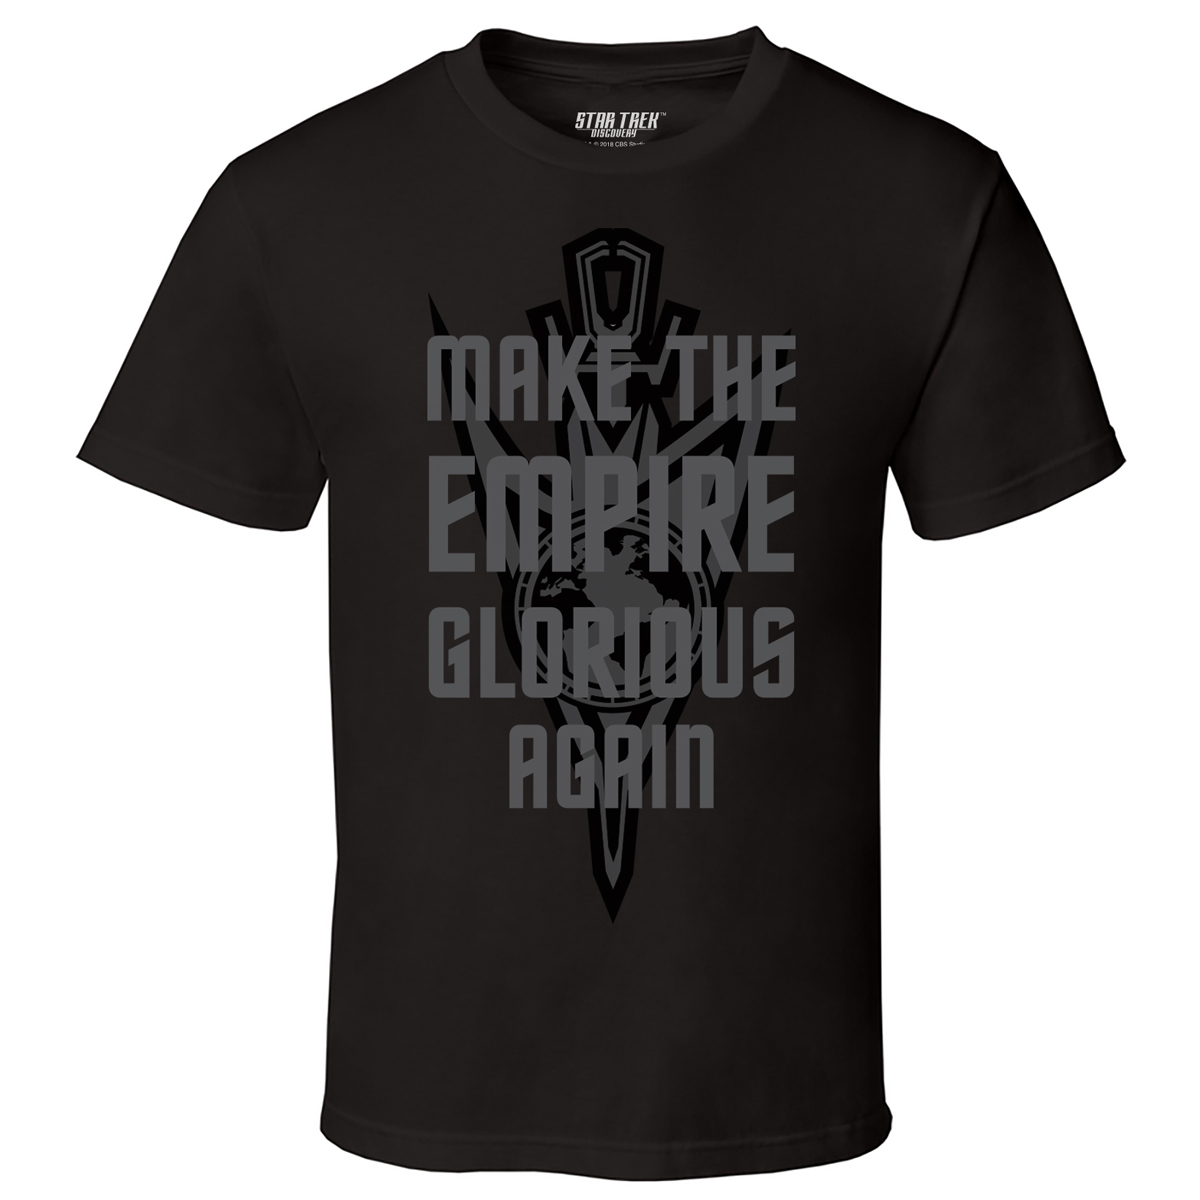 Star Trek Discovery Make the Empire Glorious Again T-Shirt